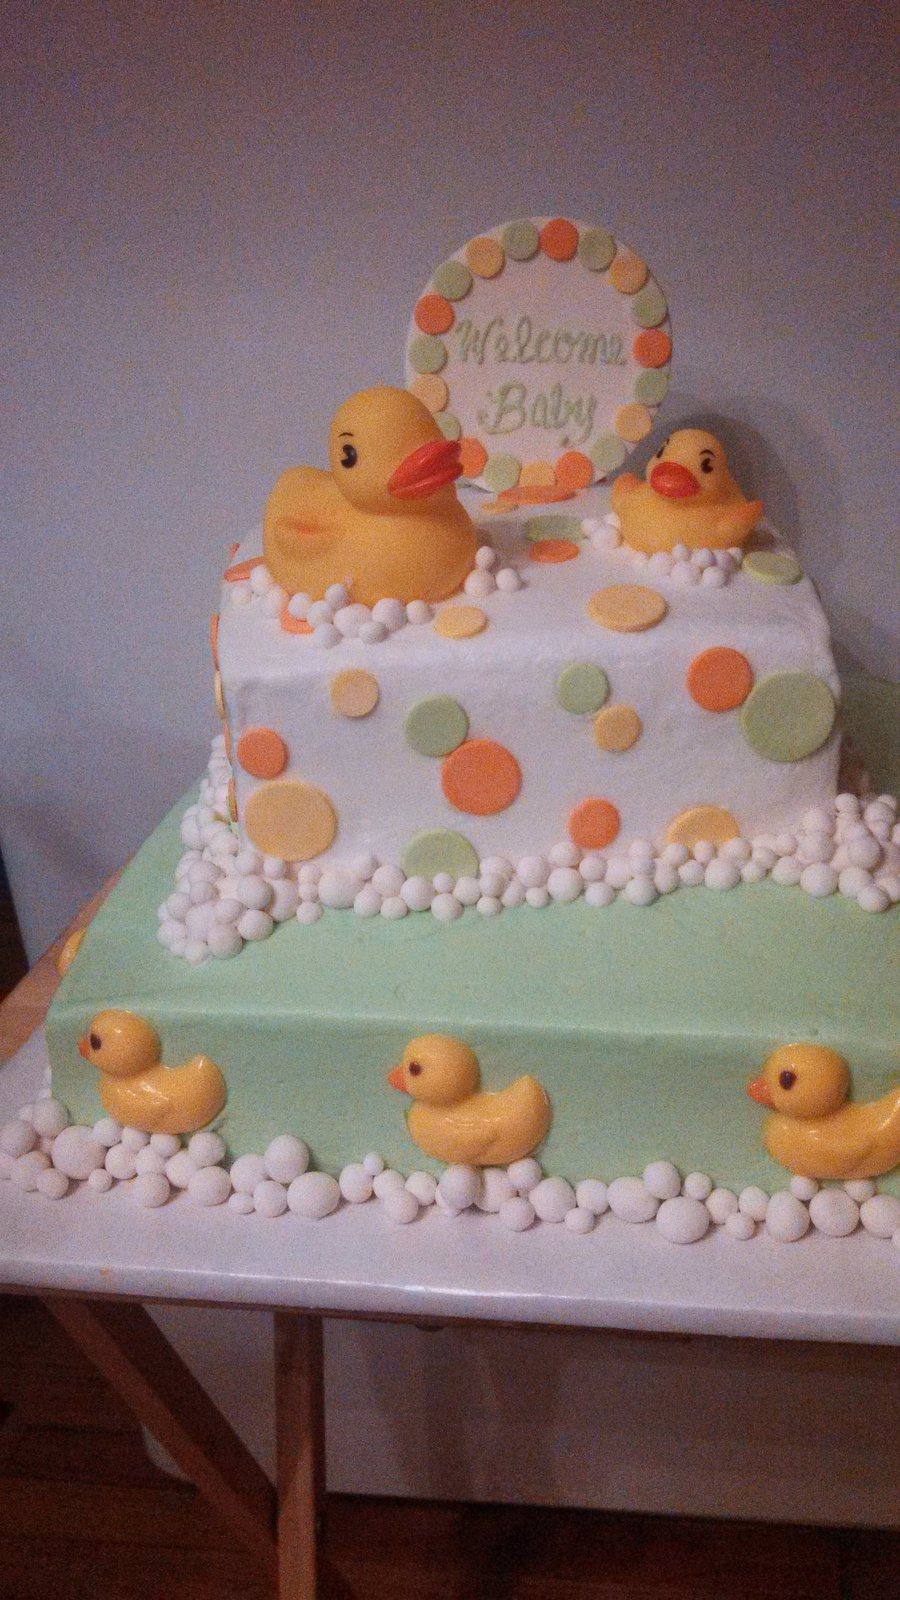 Fondant Decor On Buttercream Cake : Buttercream Frosting Fondant Decorations Candy Mold Ducks ...